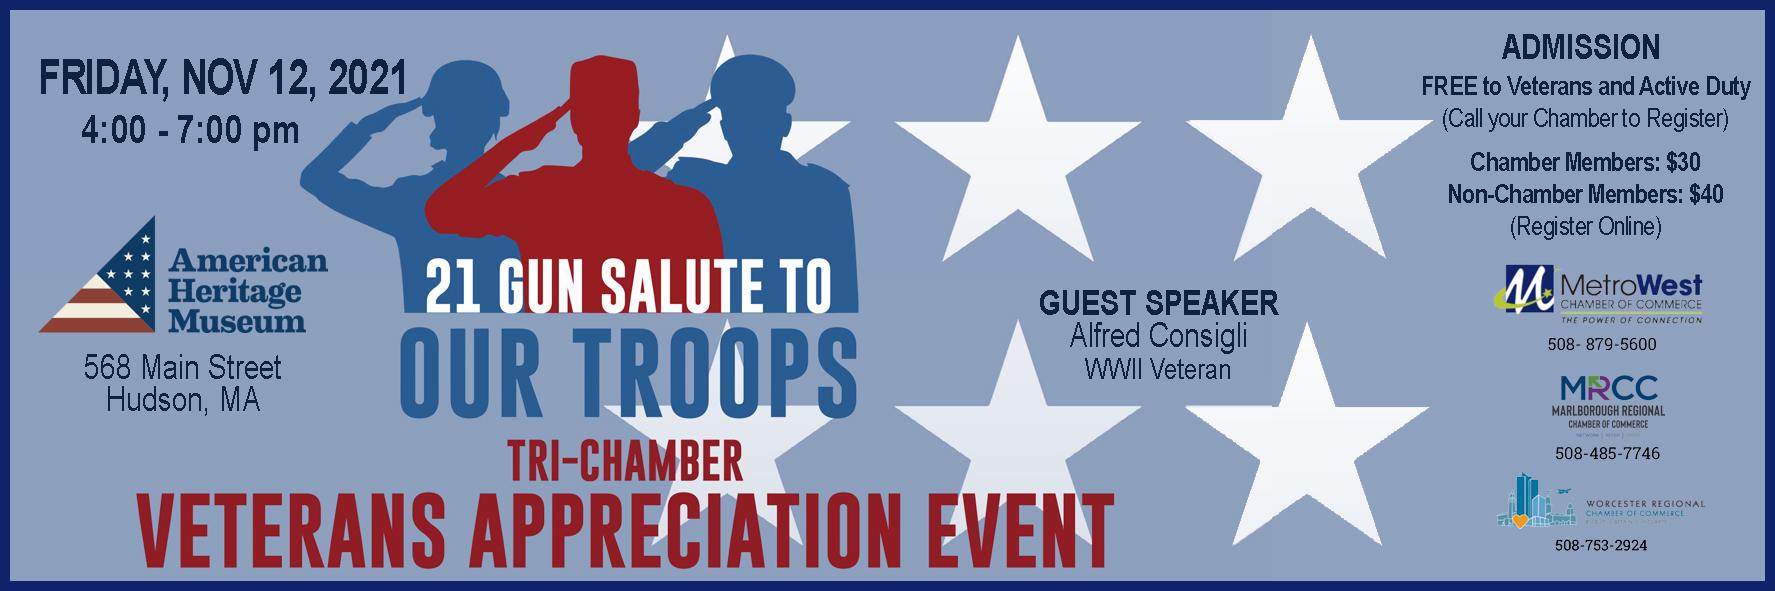 2021AnnualTRi-Chamber-Veterans-Appreciation-Event-web-Slider.jpg